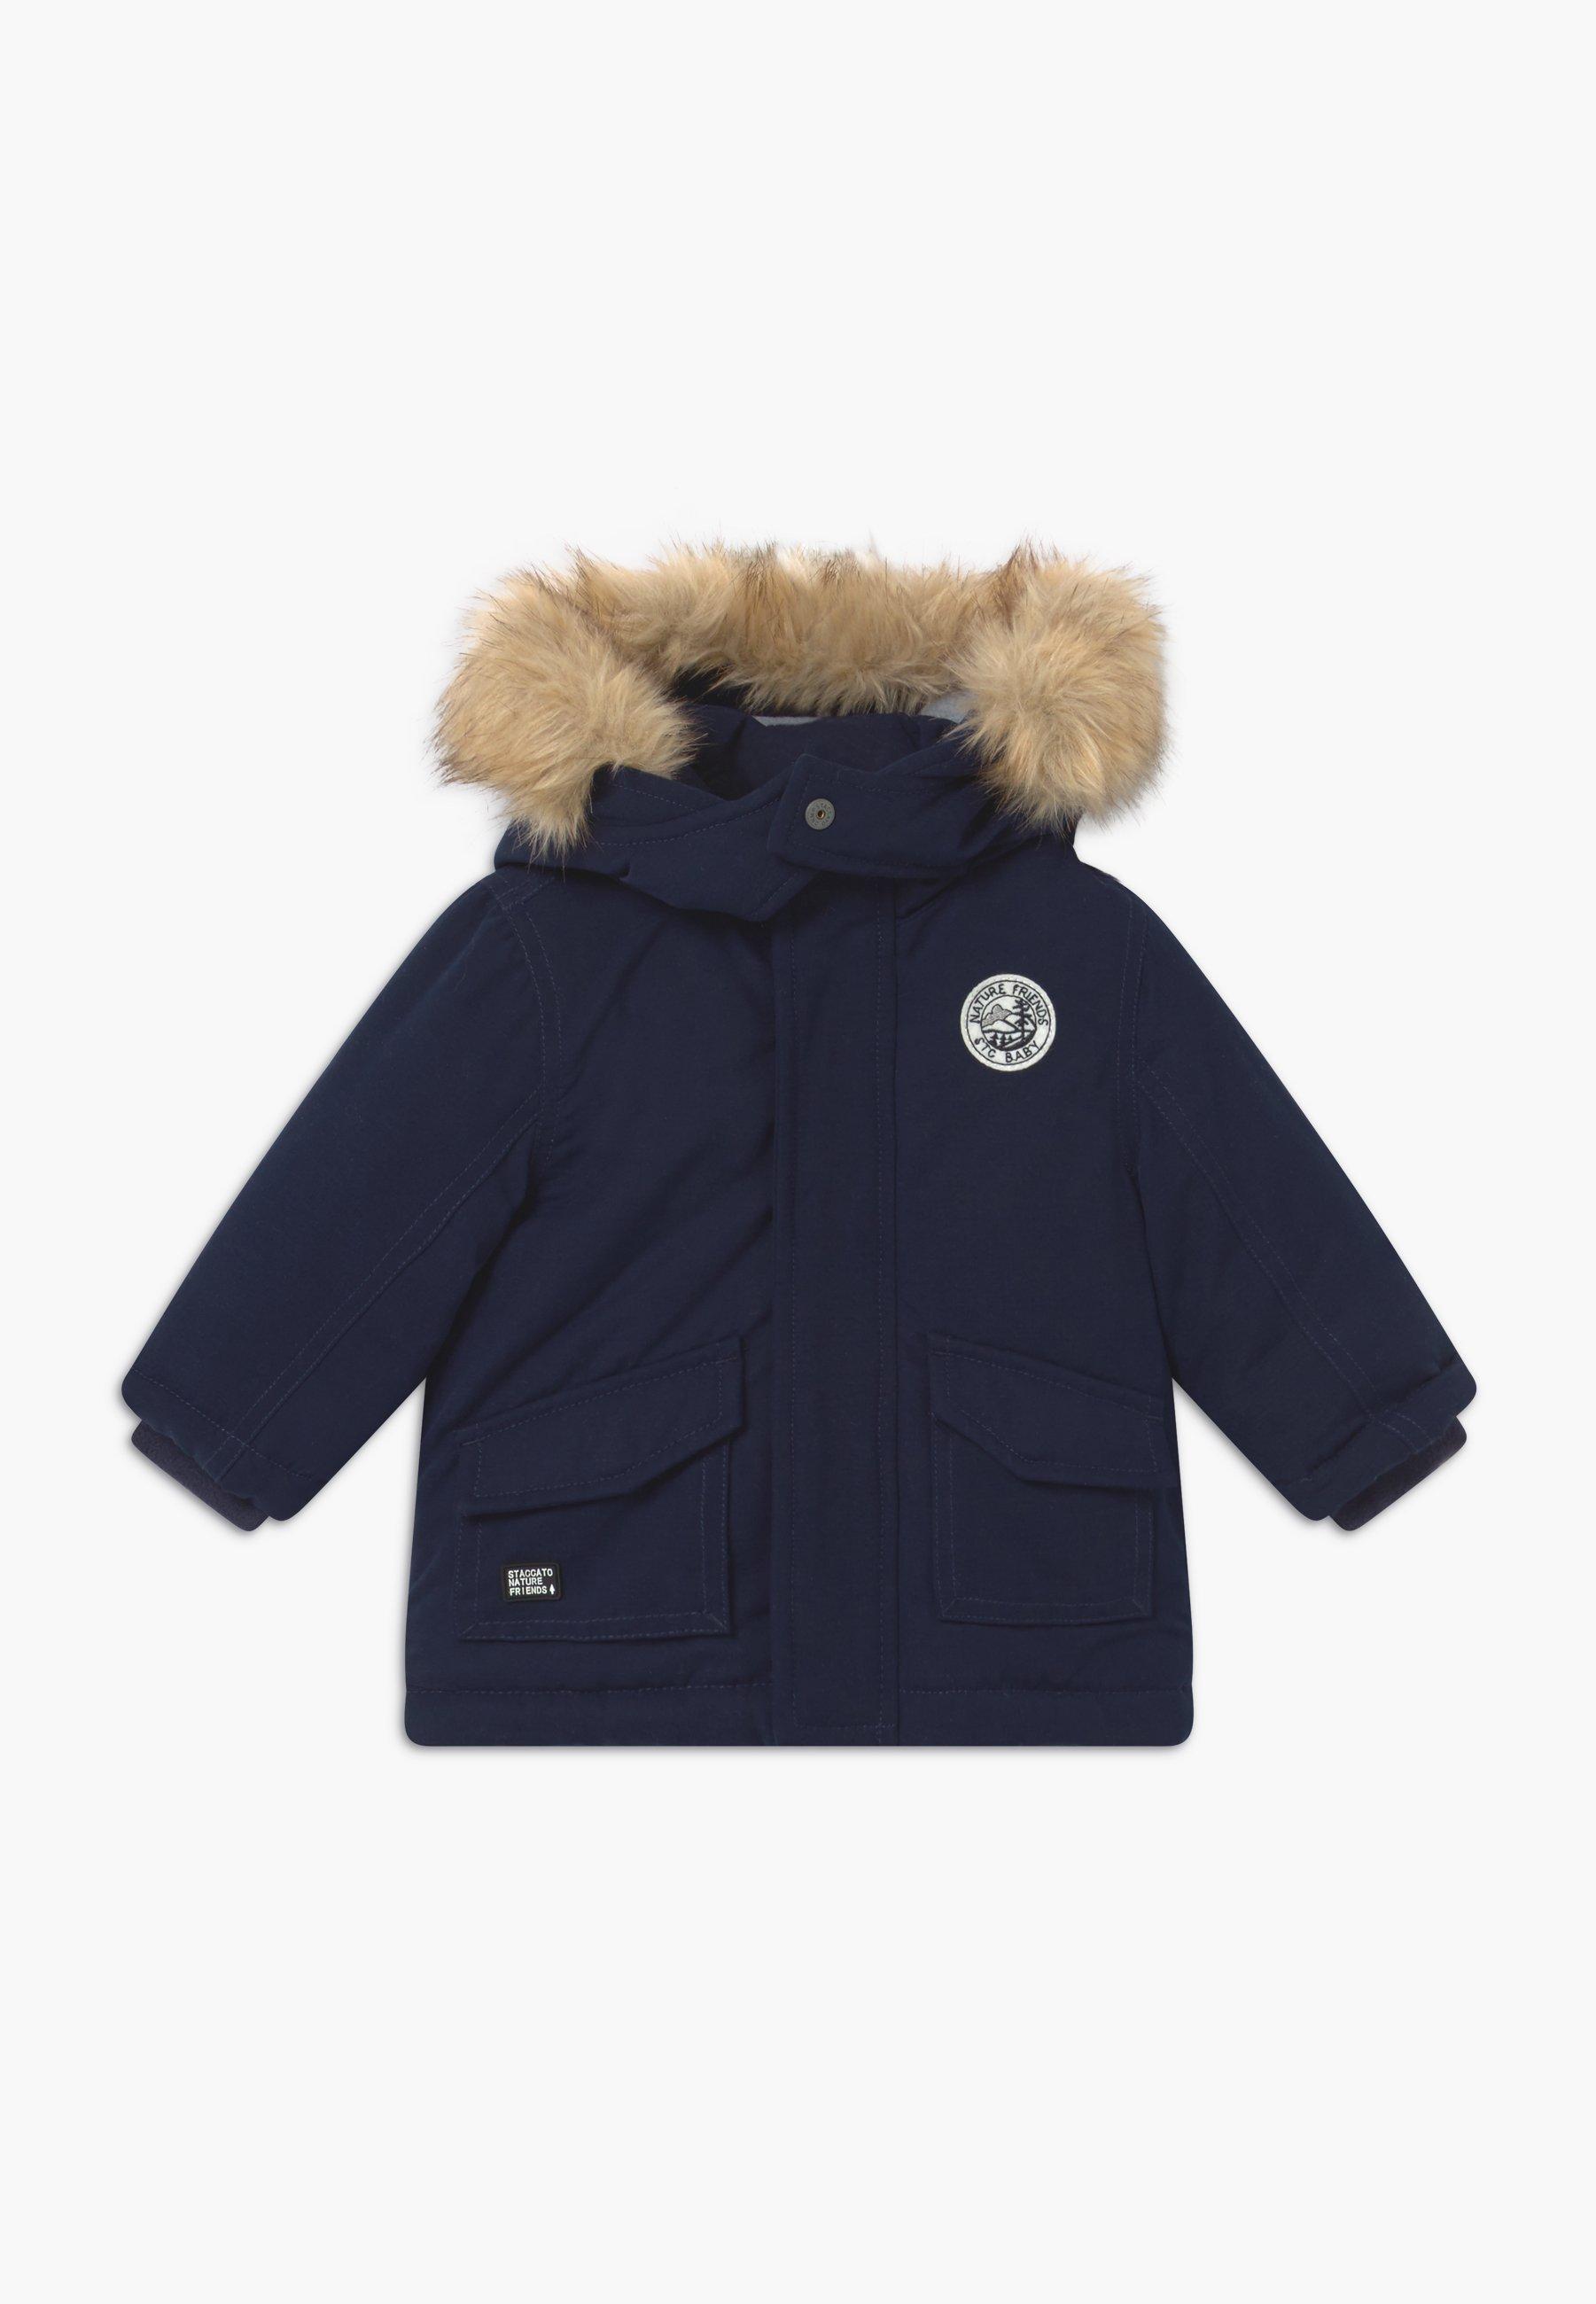 2013 Wholesale Staccato Winter coat - navy | kids's clothing 2020 veUKz